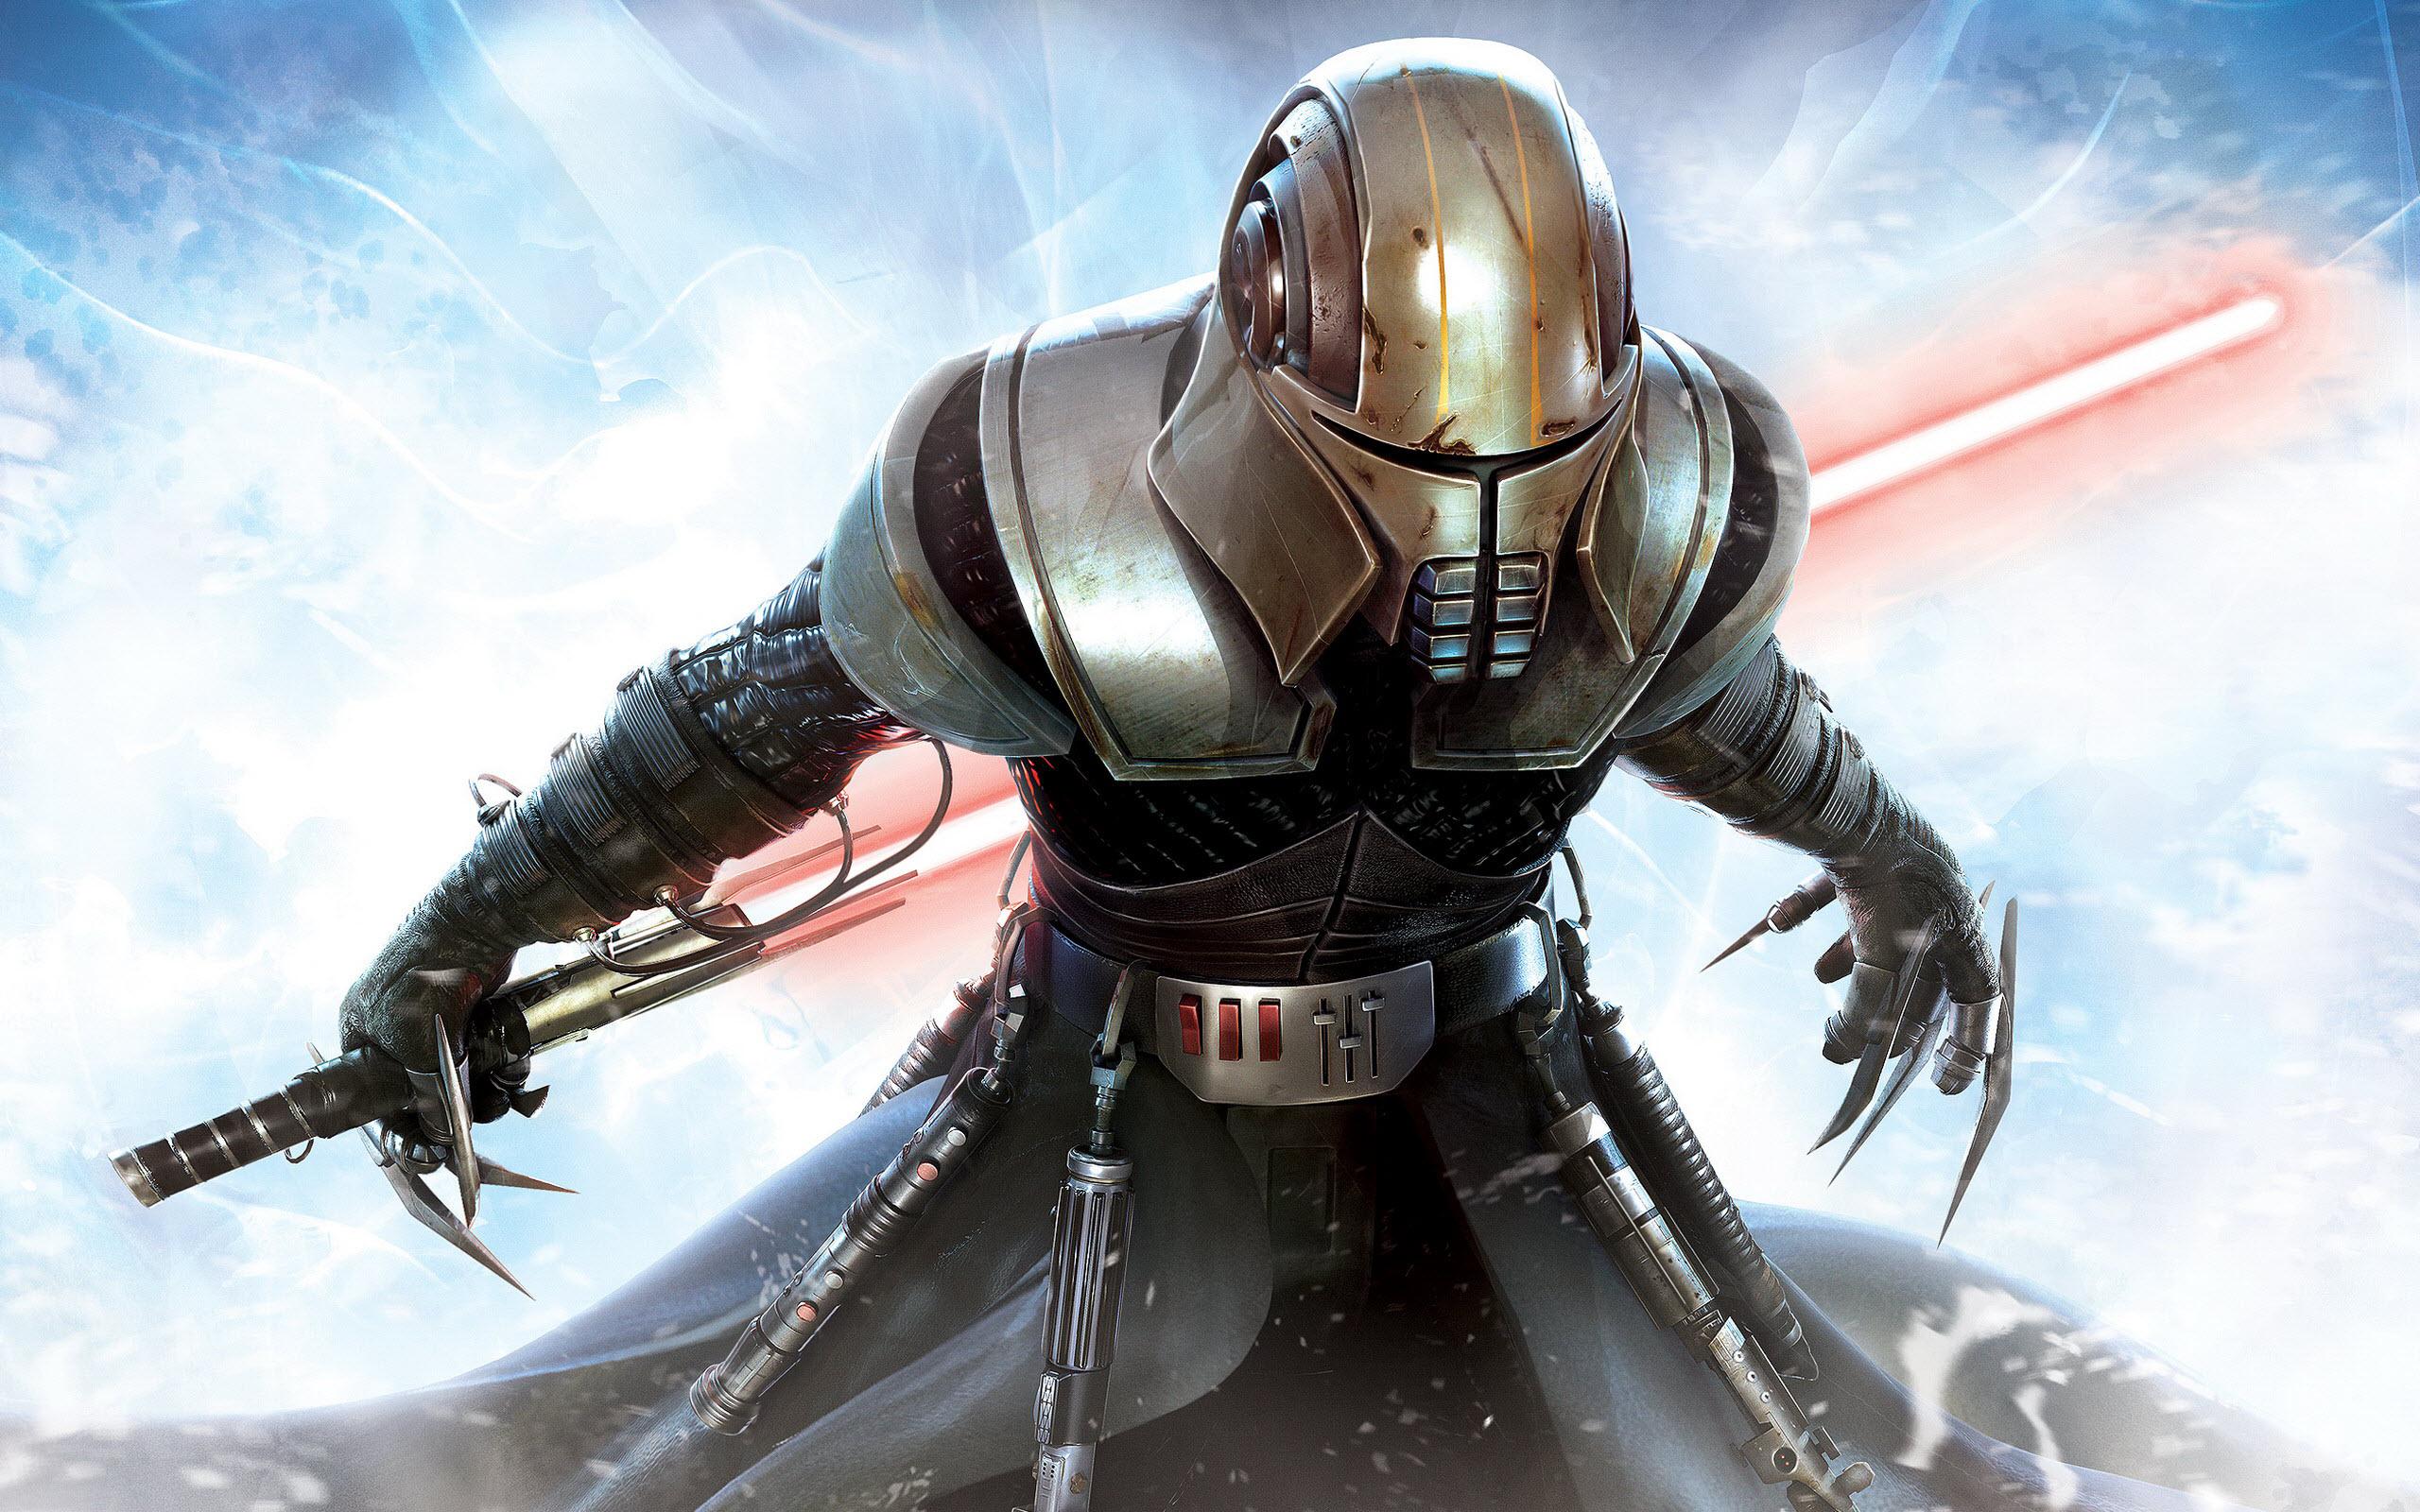 Star wars wallpaper hd 1080p iconos   Taringa 2560x1600